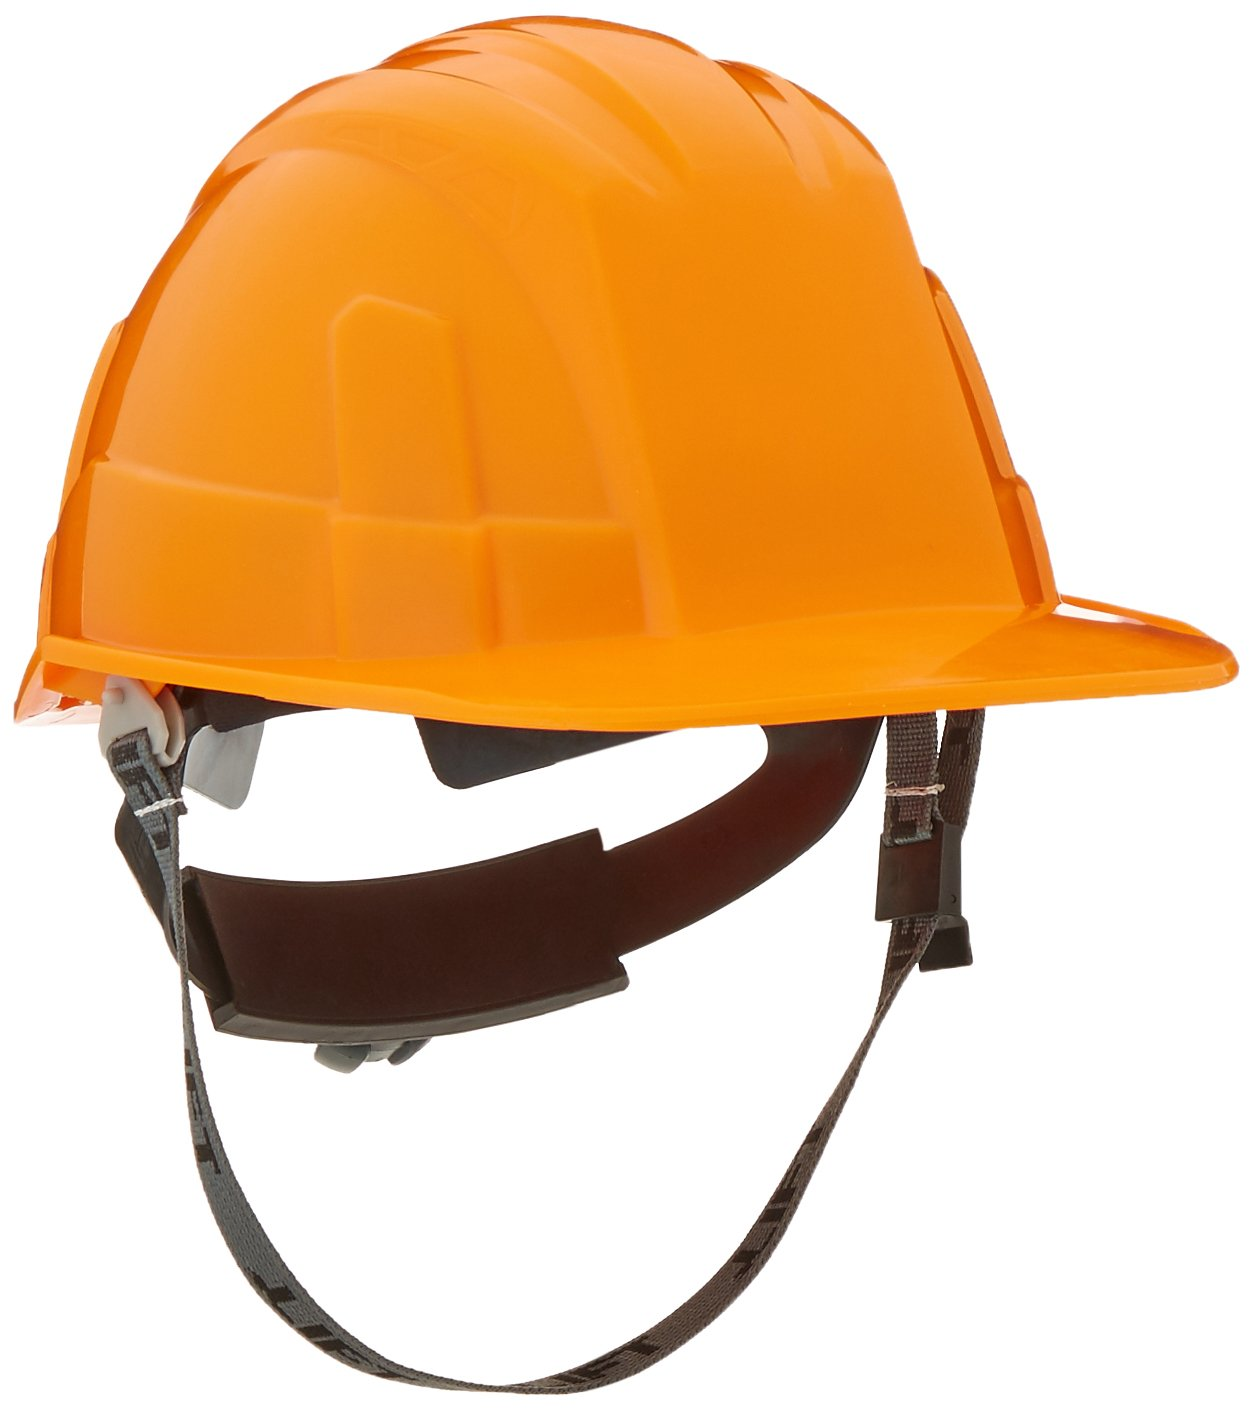 85%OFF LIFT Safety Vantis VS Standard Brim Hard Hat (Orange, One